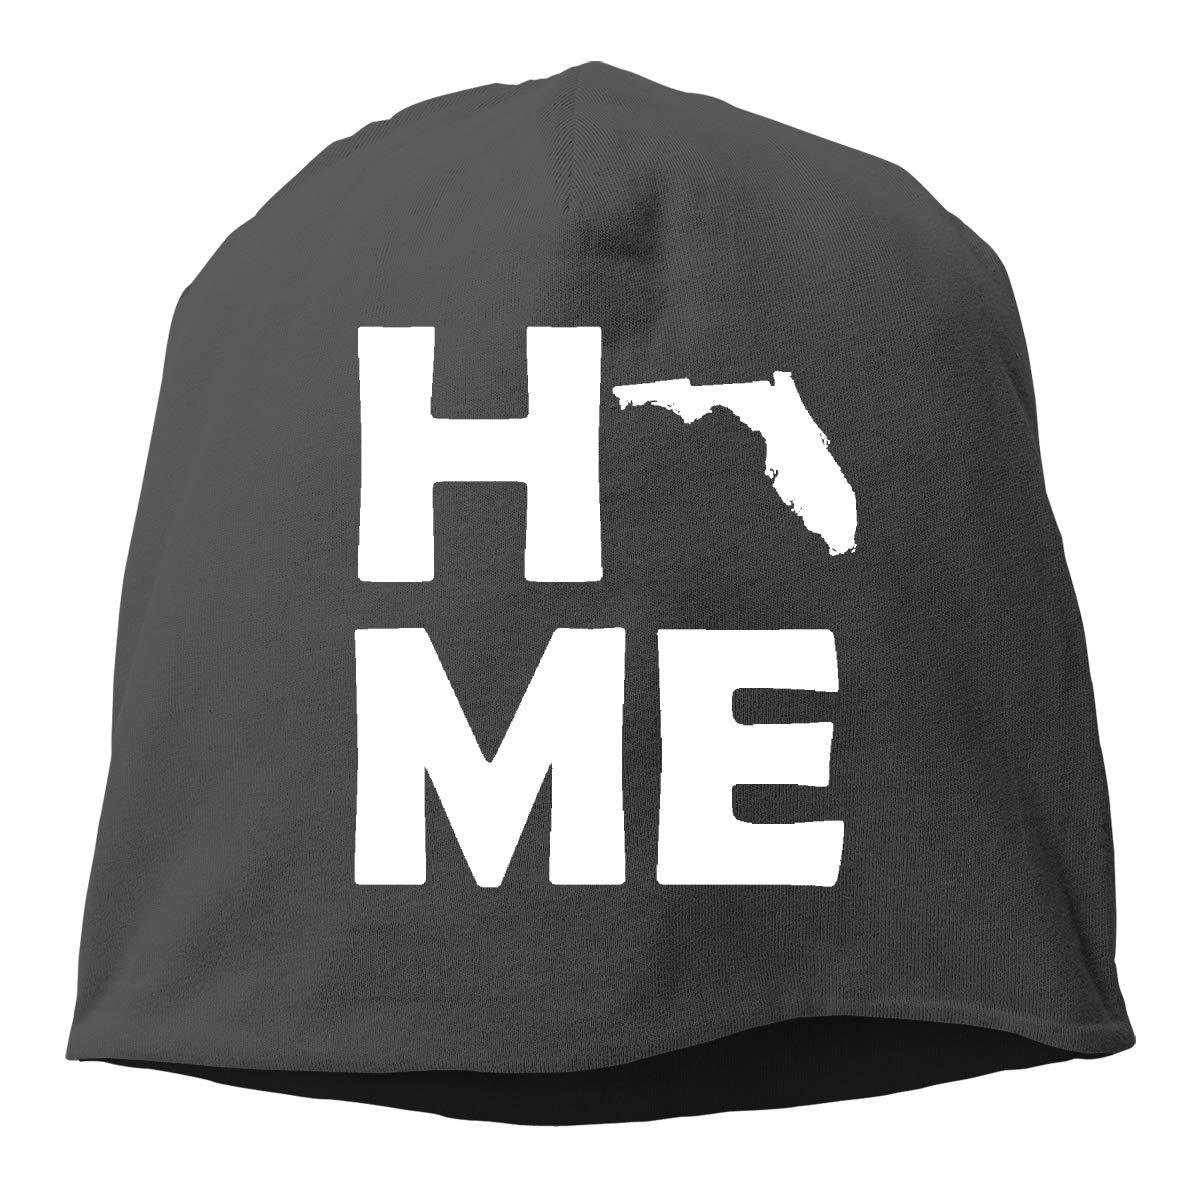 Florida Home Unisex Knitted Hat Beanie Hat Warm Hats Skull Cap Beanie Hat